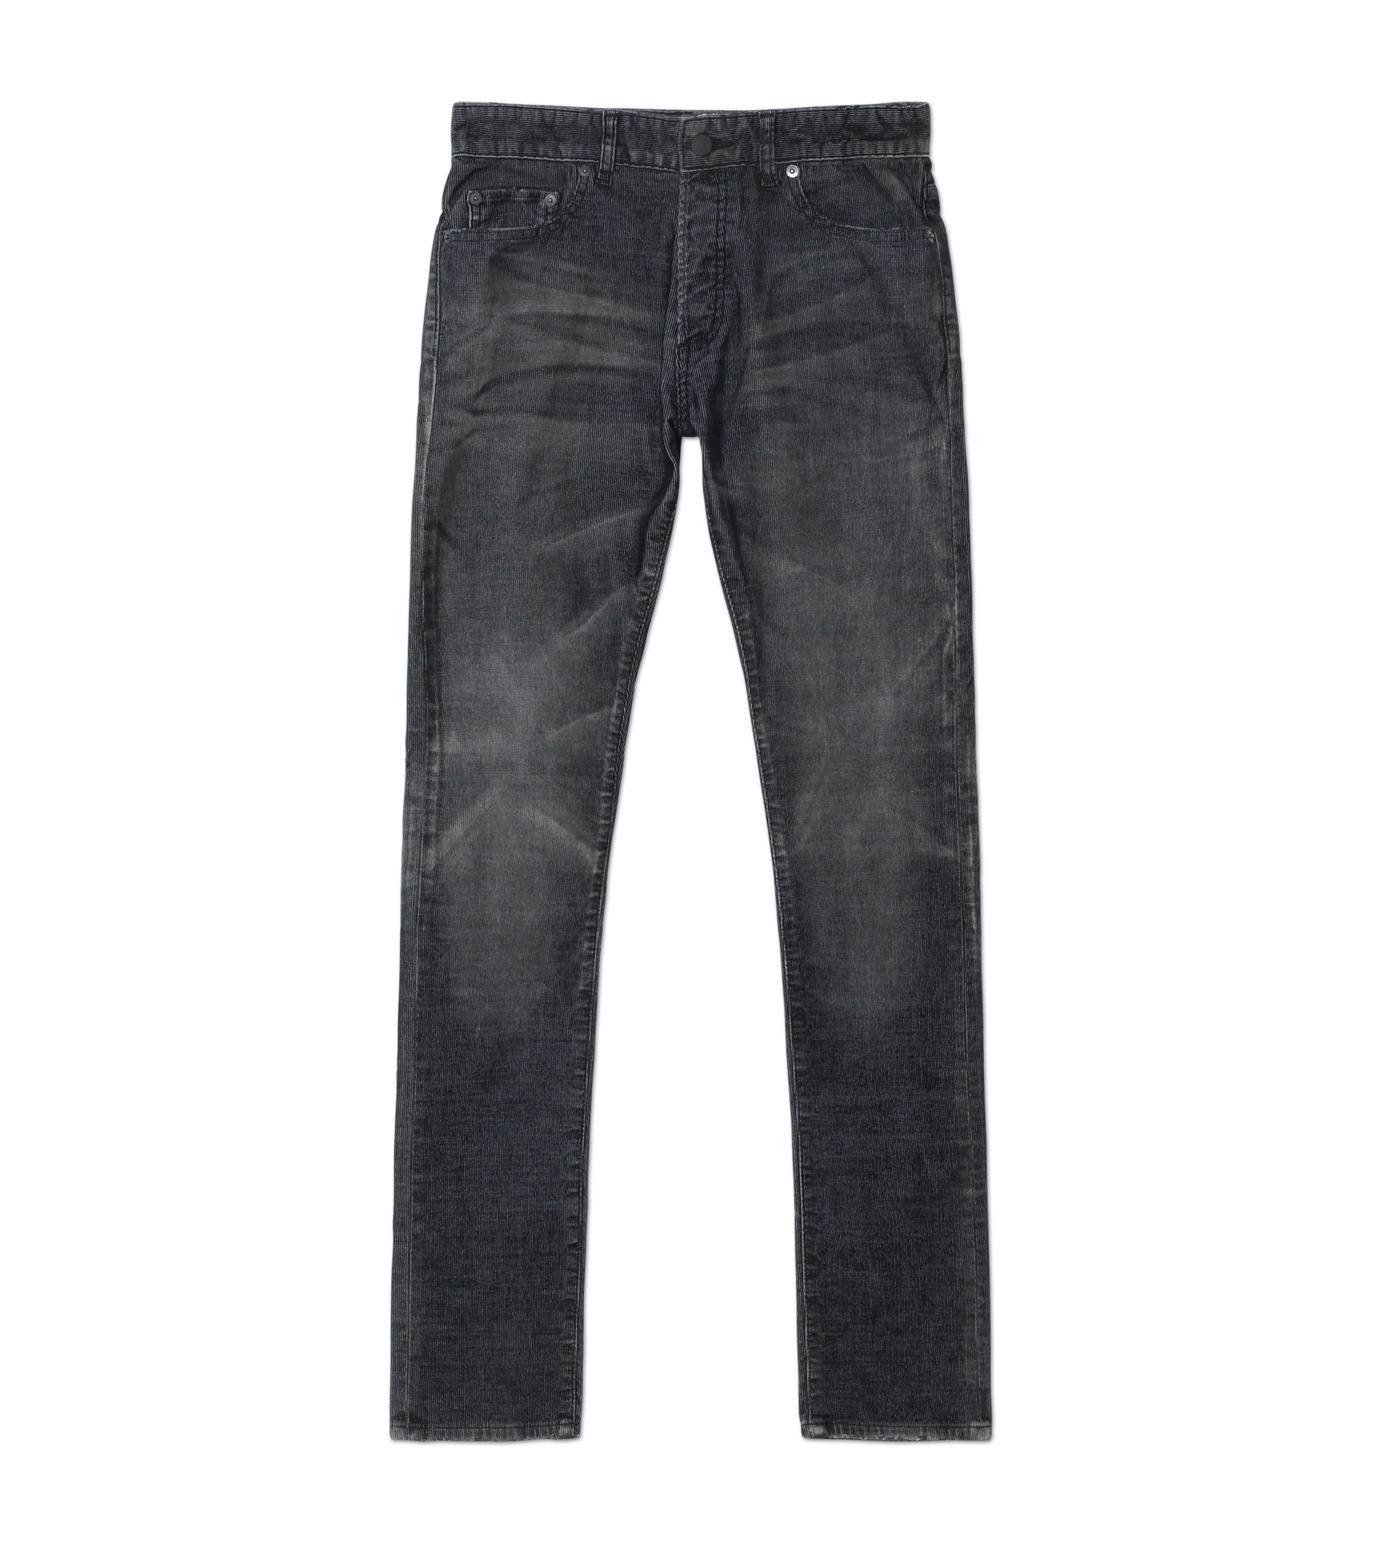 HL HEDDIE LOVU(エイチエル・エディールーヴ)のCORDUROY WASH PANTS-GRAY(パンツ/pants)-18A98003-11 拡大詳細画像1